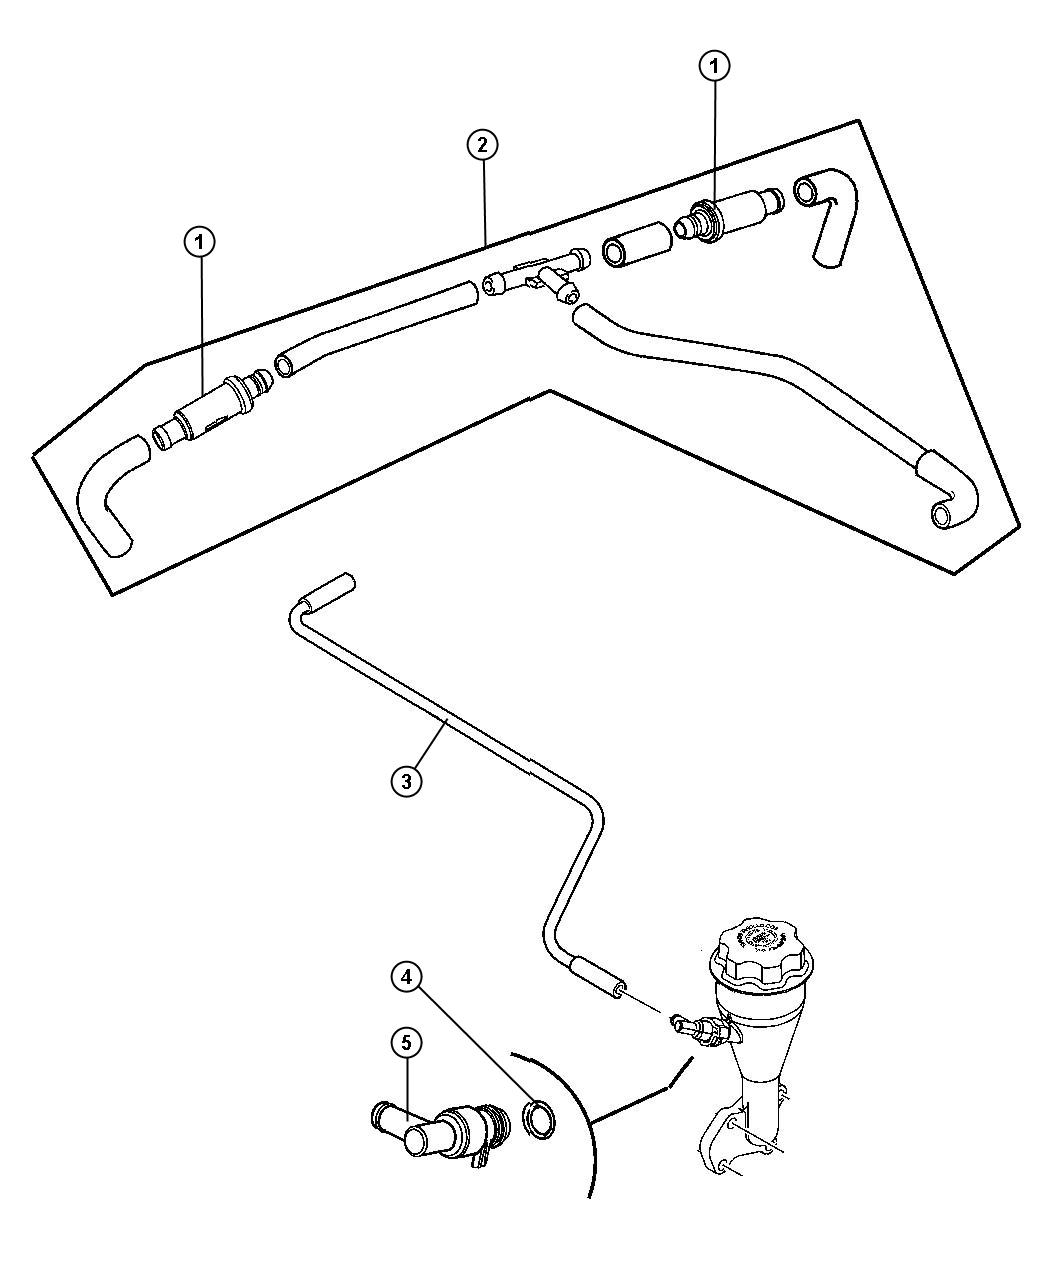 2005 dodge ram 1500 5 7 engine diagram dodge wiring diagrams